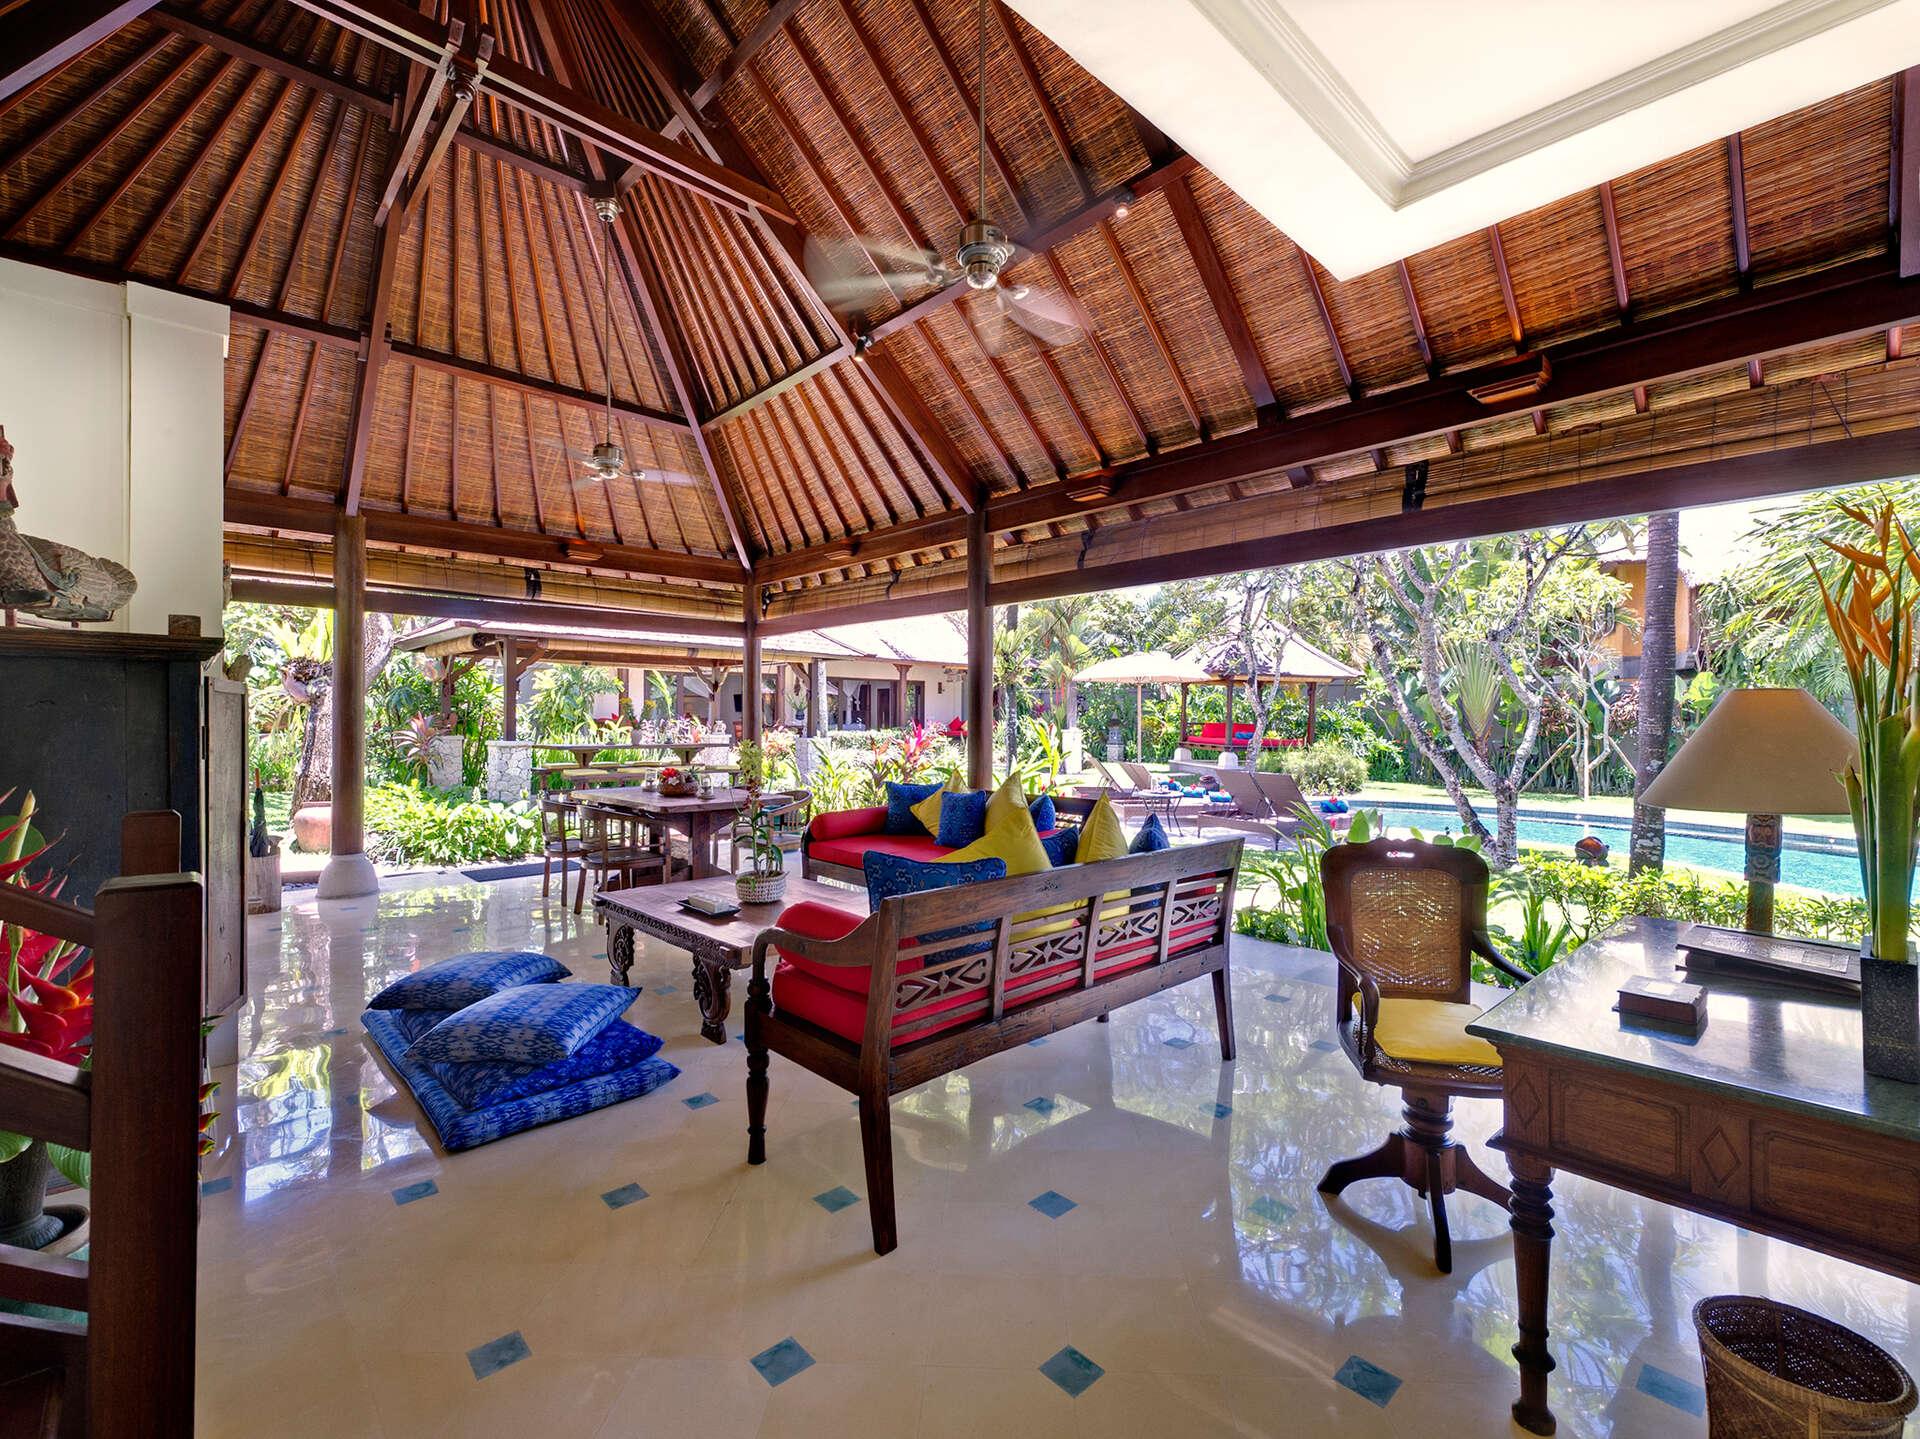 Luxury villa rentals asia - Indonesia - Bali - Canggu - Kakatua - Image 1/14